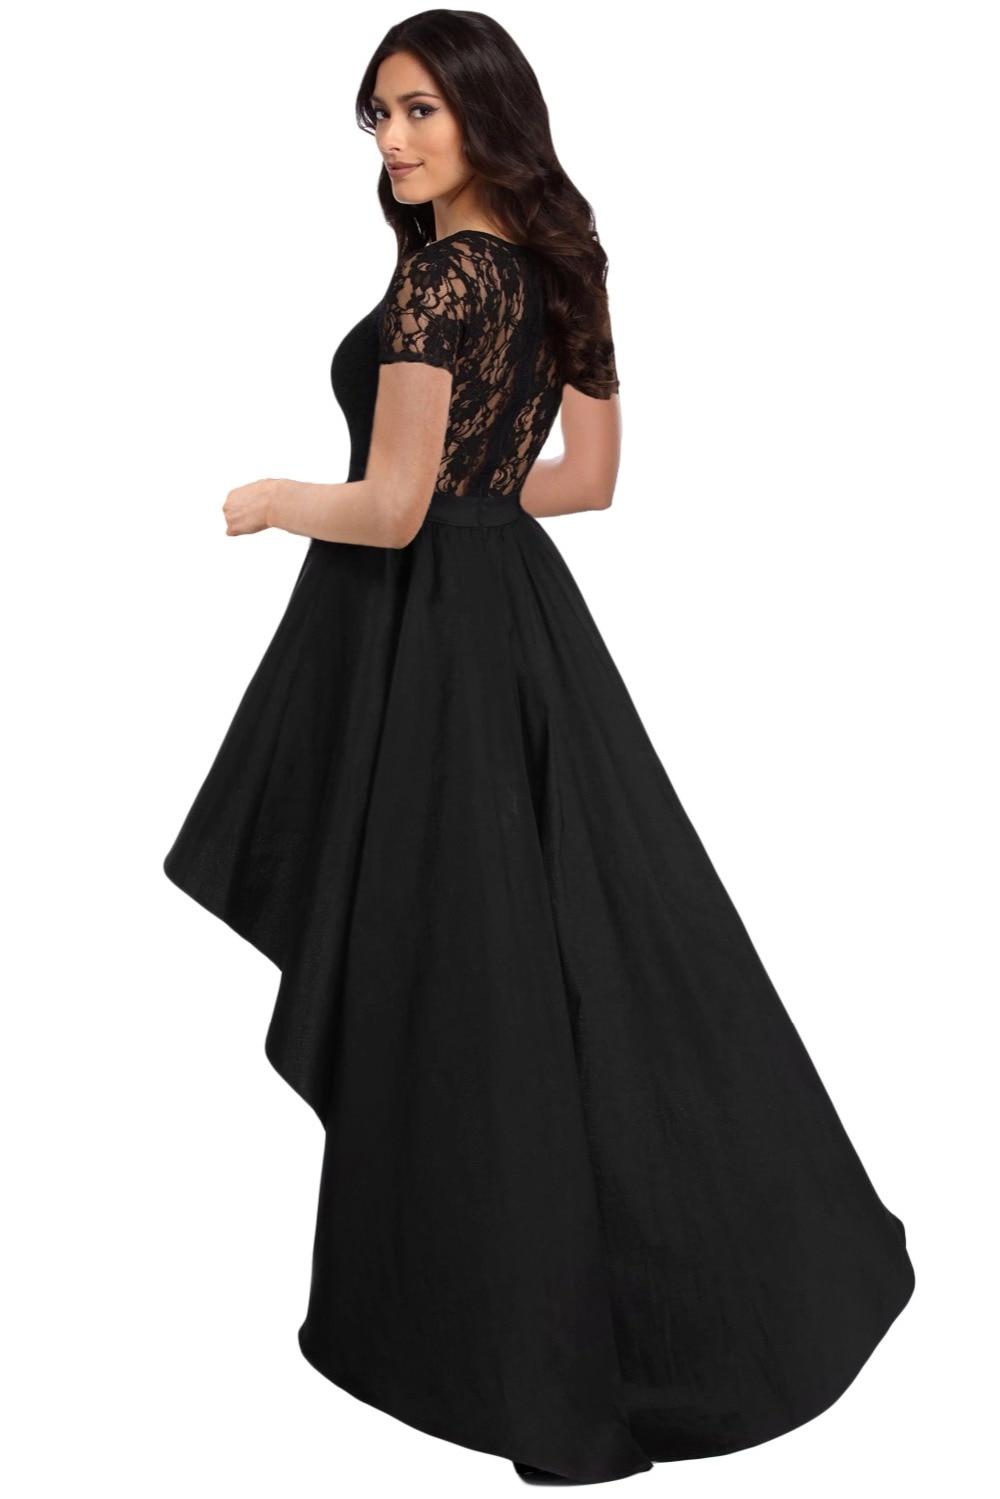 Zmvkgsoa Party Gowns Royal Black Lace Bodice Elegant Short Sleeve ...